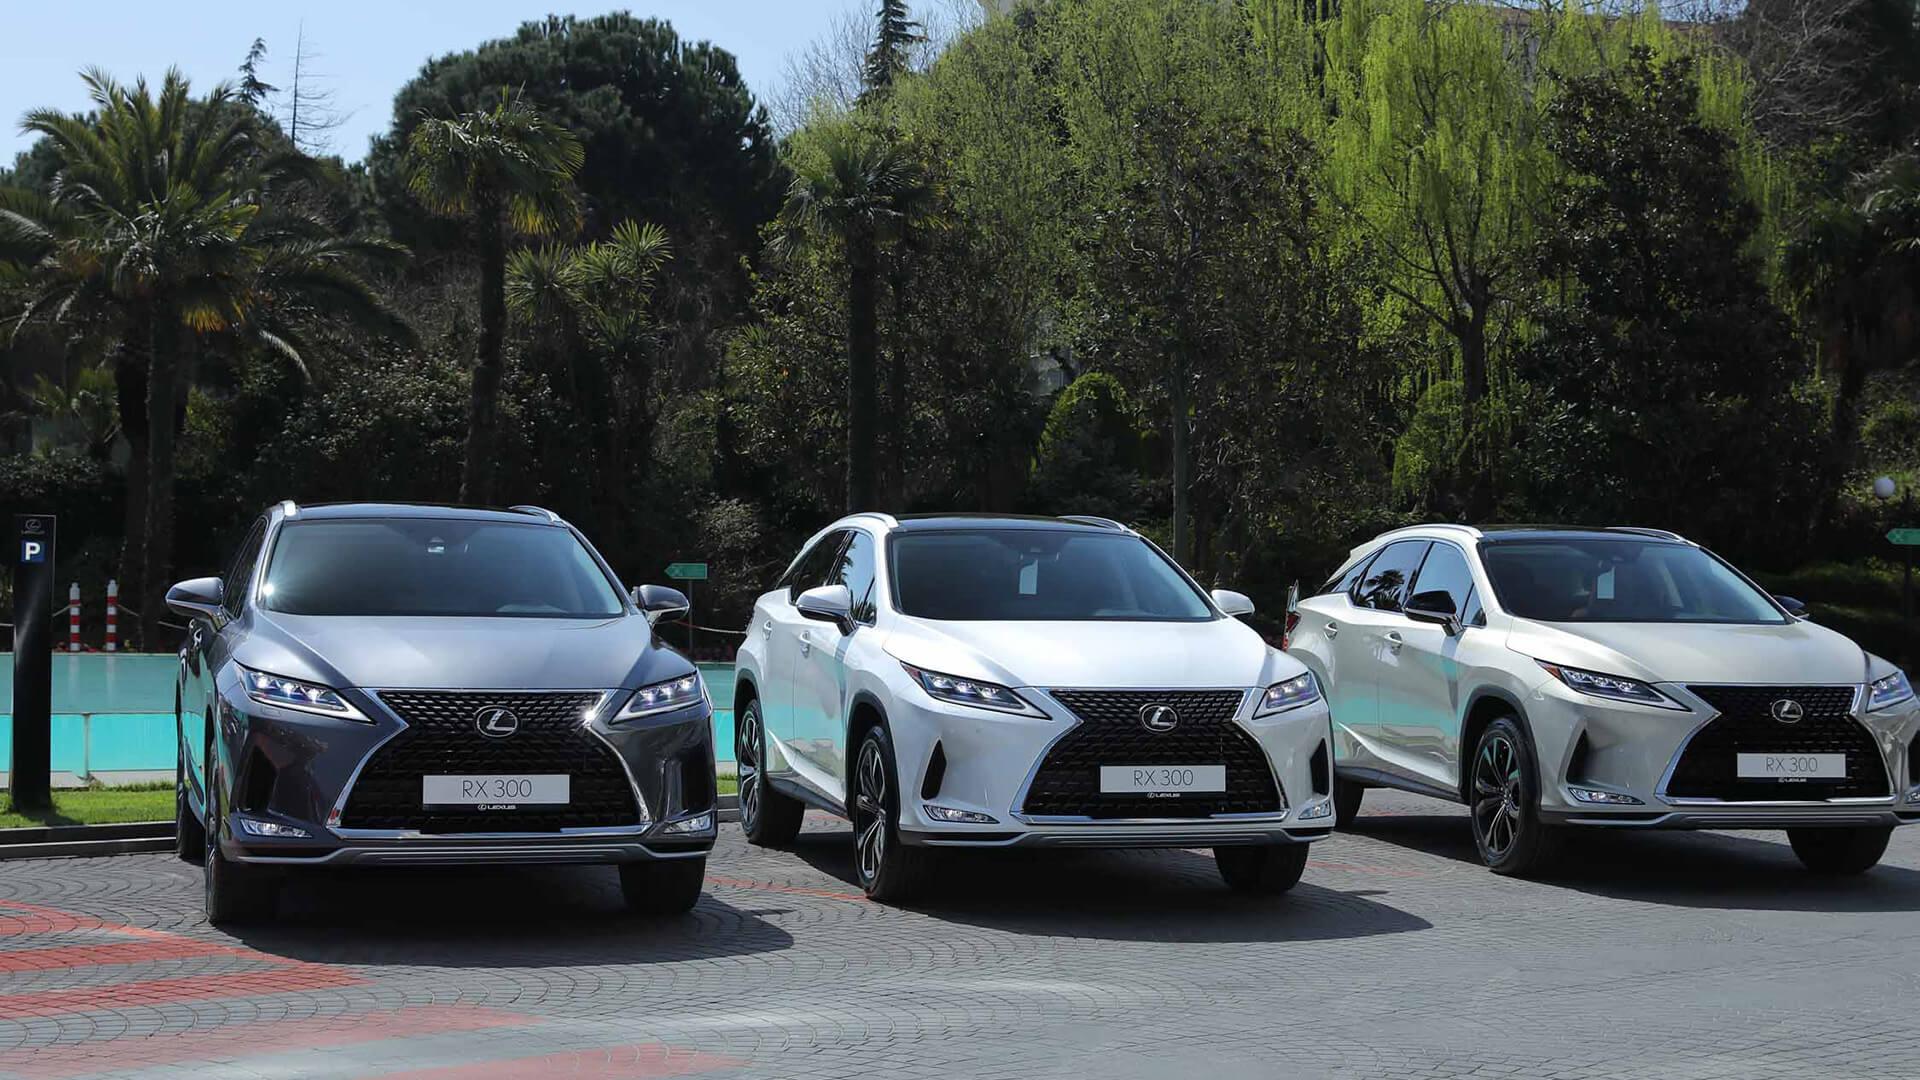 Dünyanın İlk Premium SUV'u Lexus RX gallery03